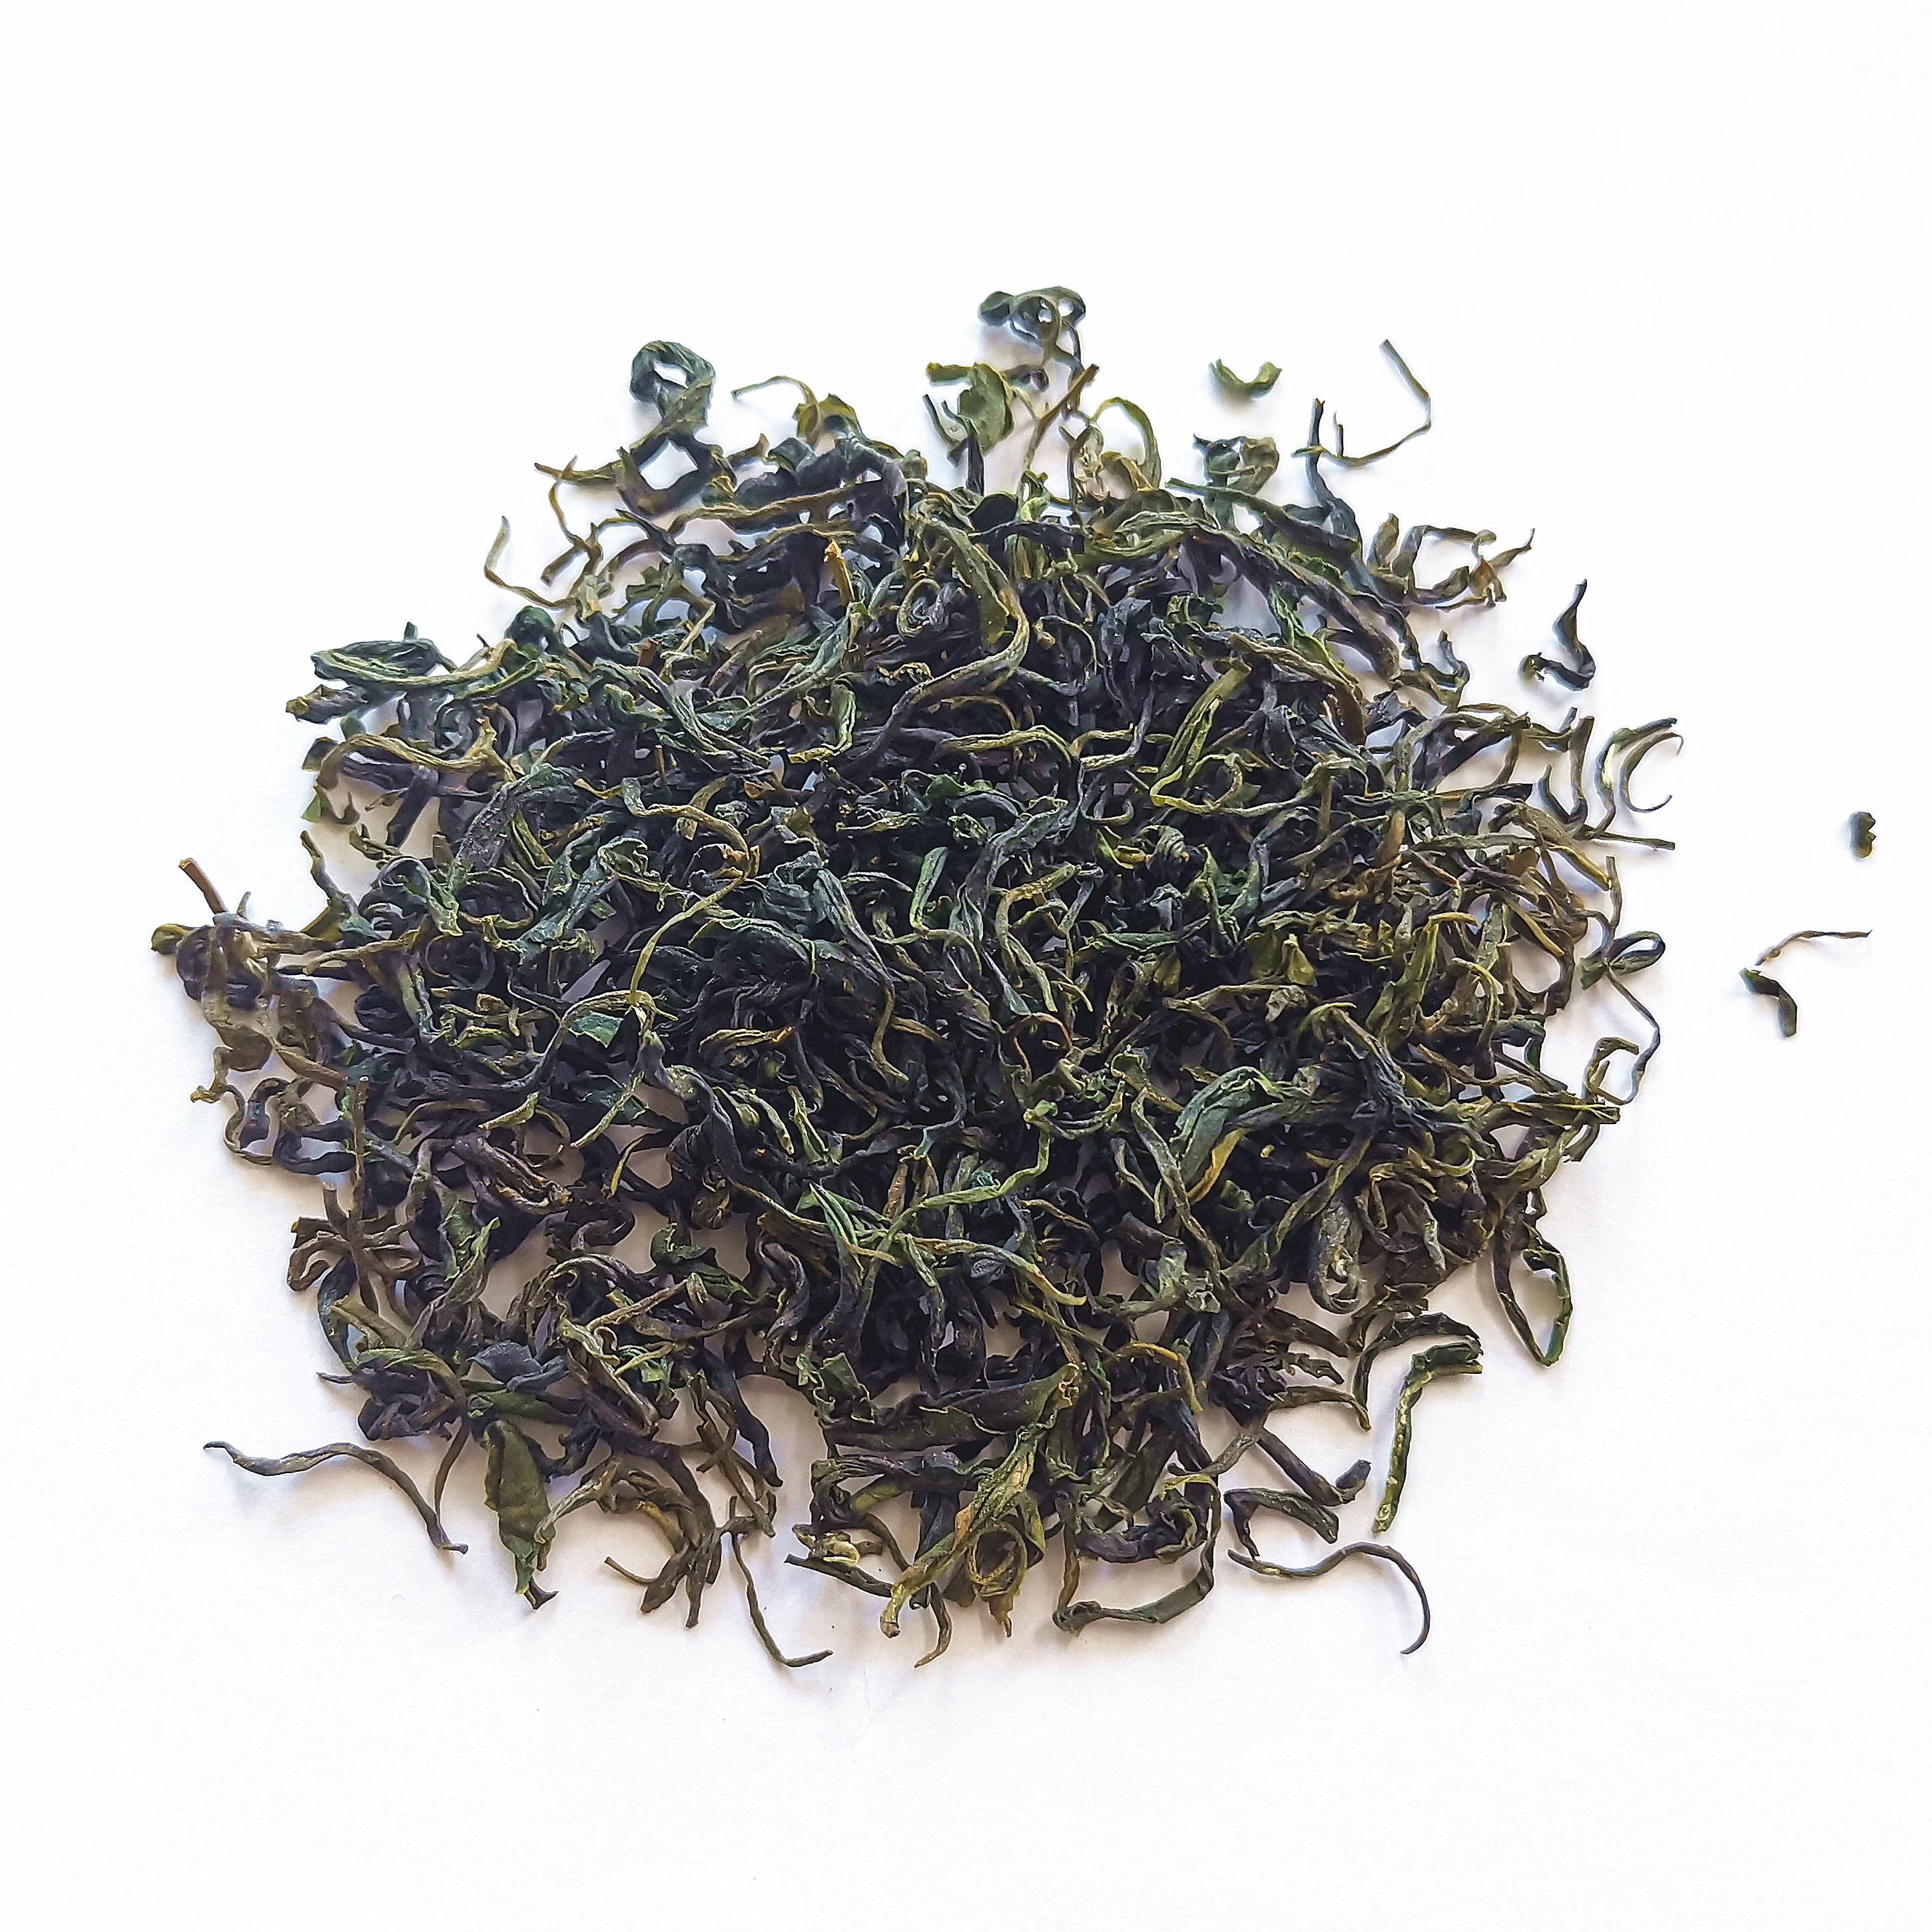 Online tea shopping organic private label mountain tea green - 4uTea | 4uTea.com